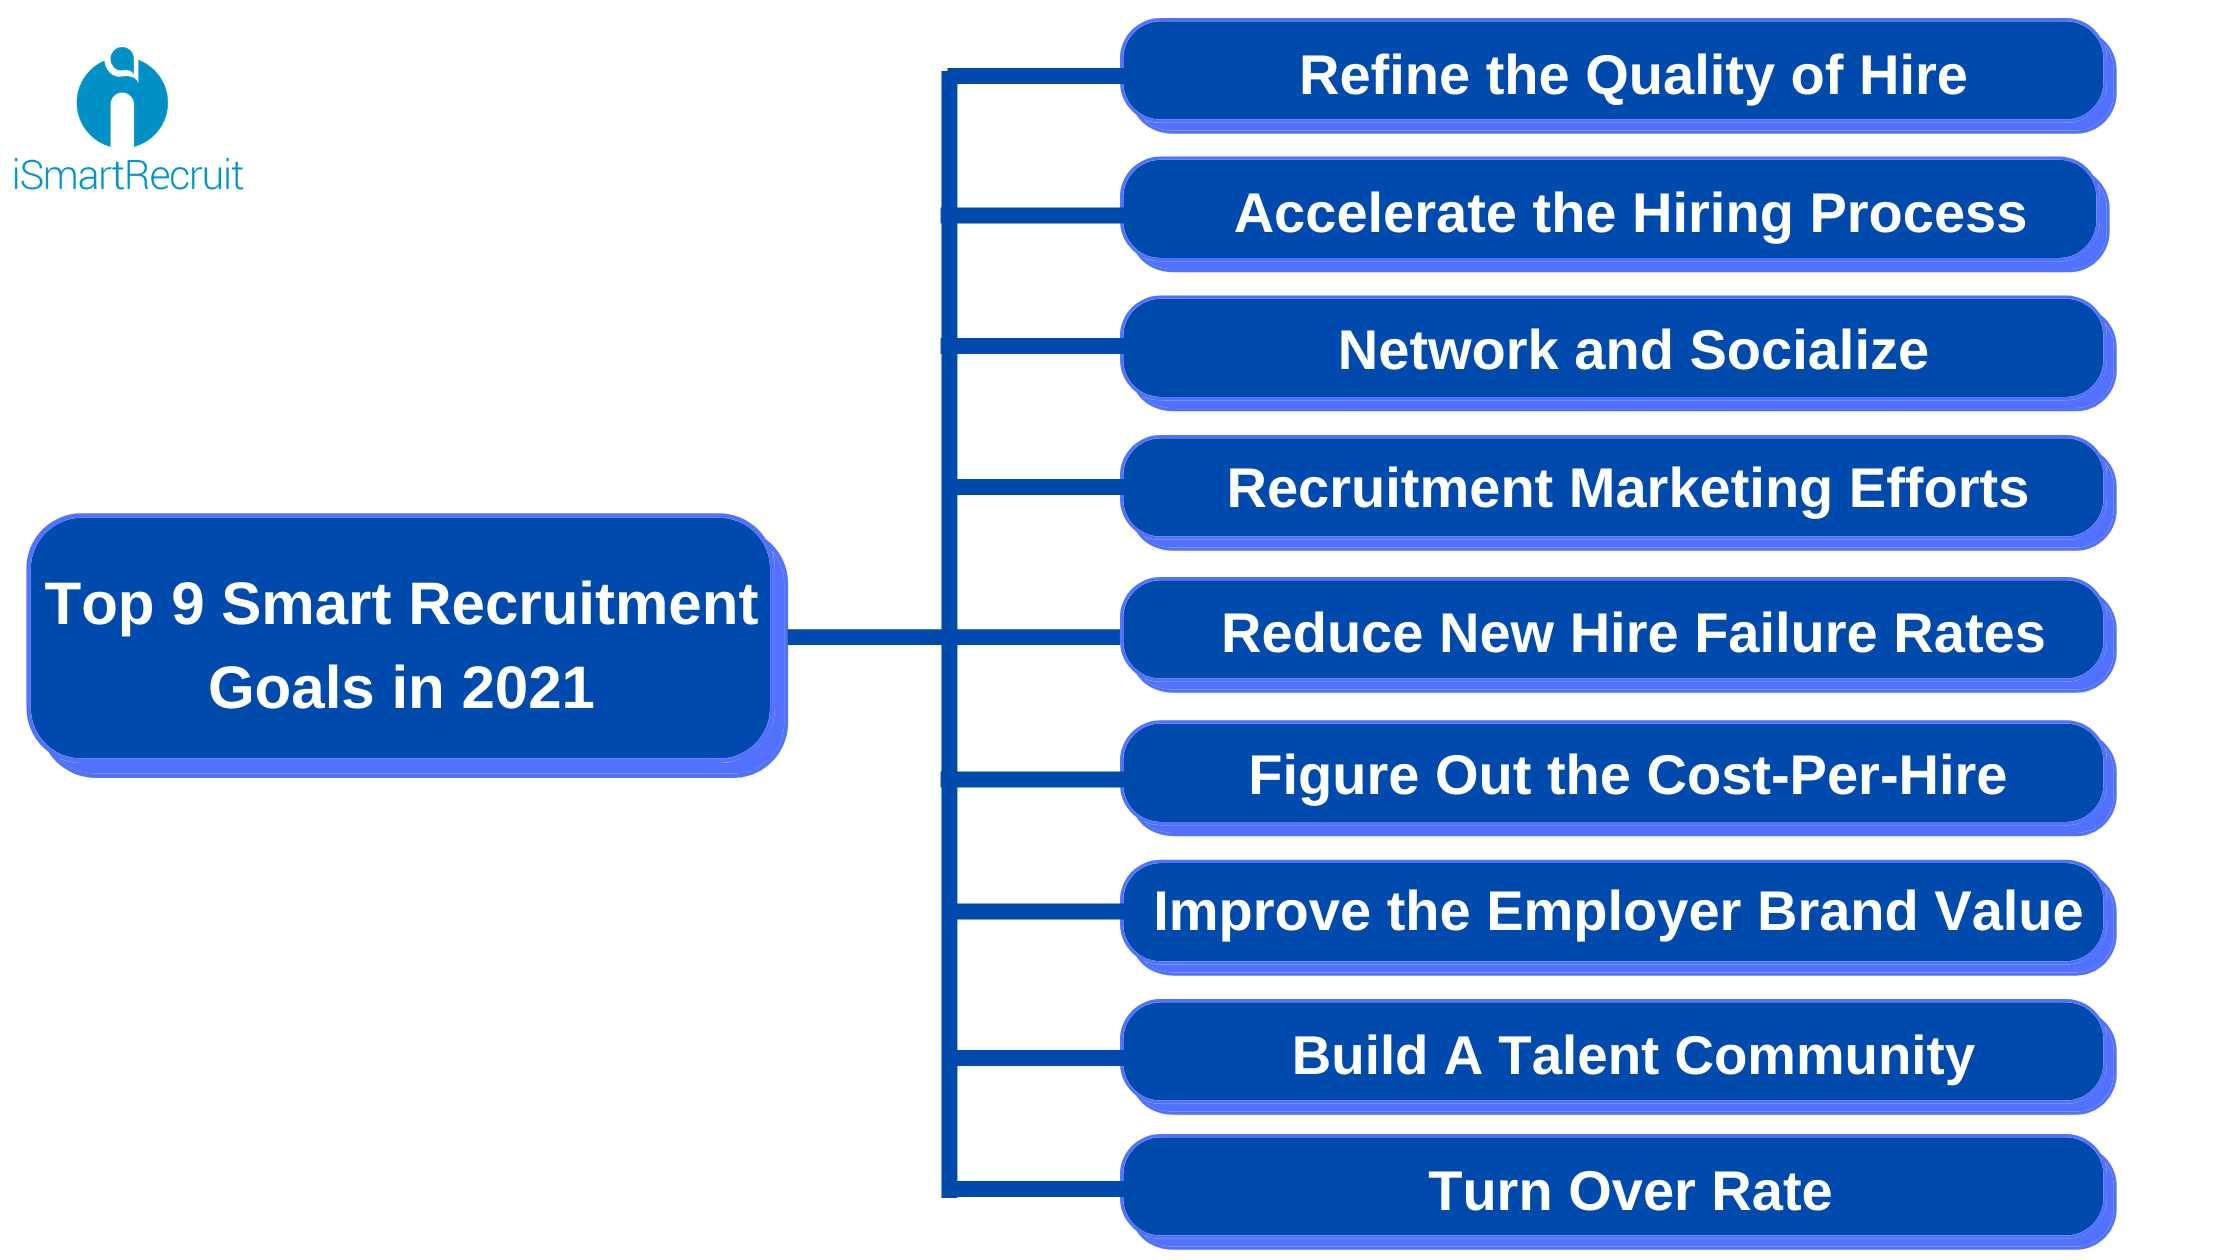 Top 9 Smart Recruitment Goals